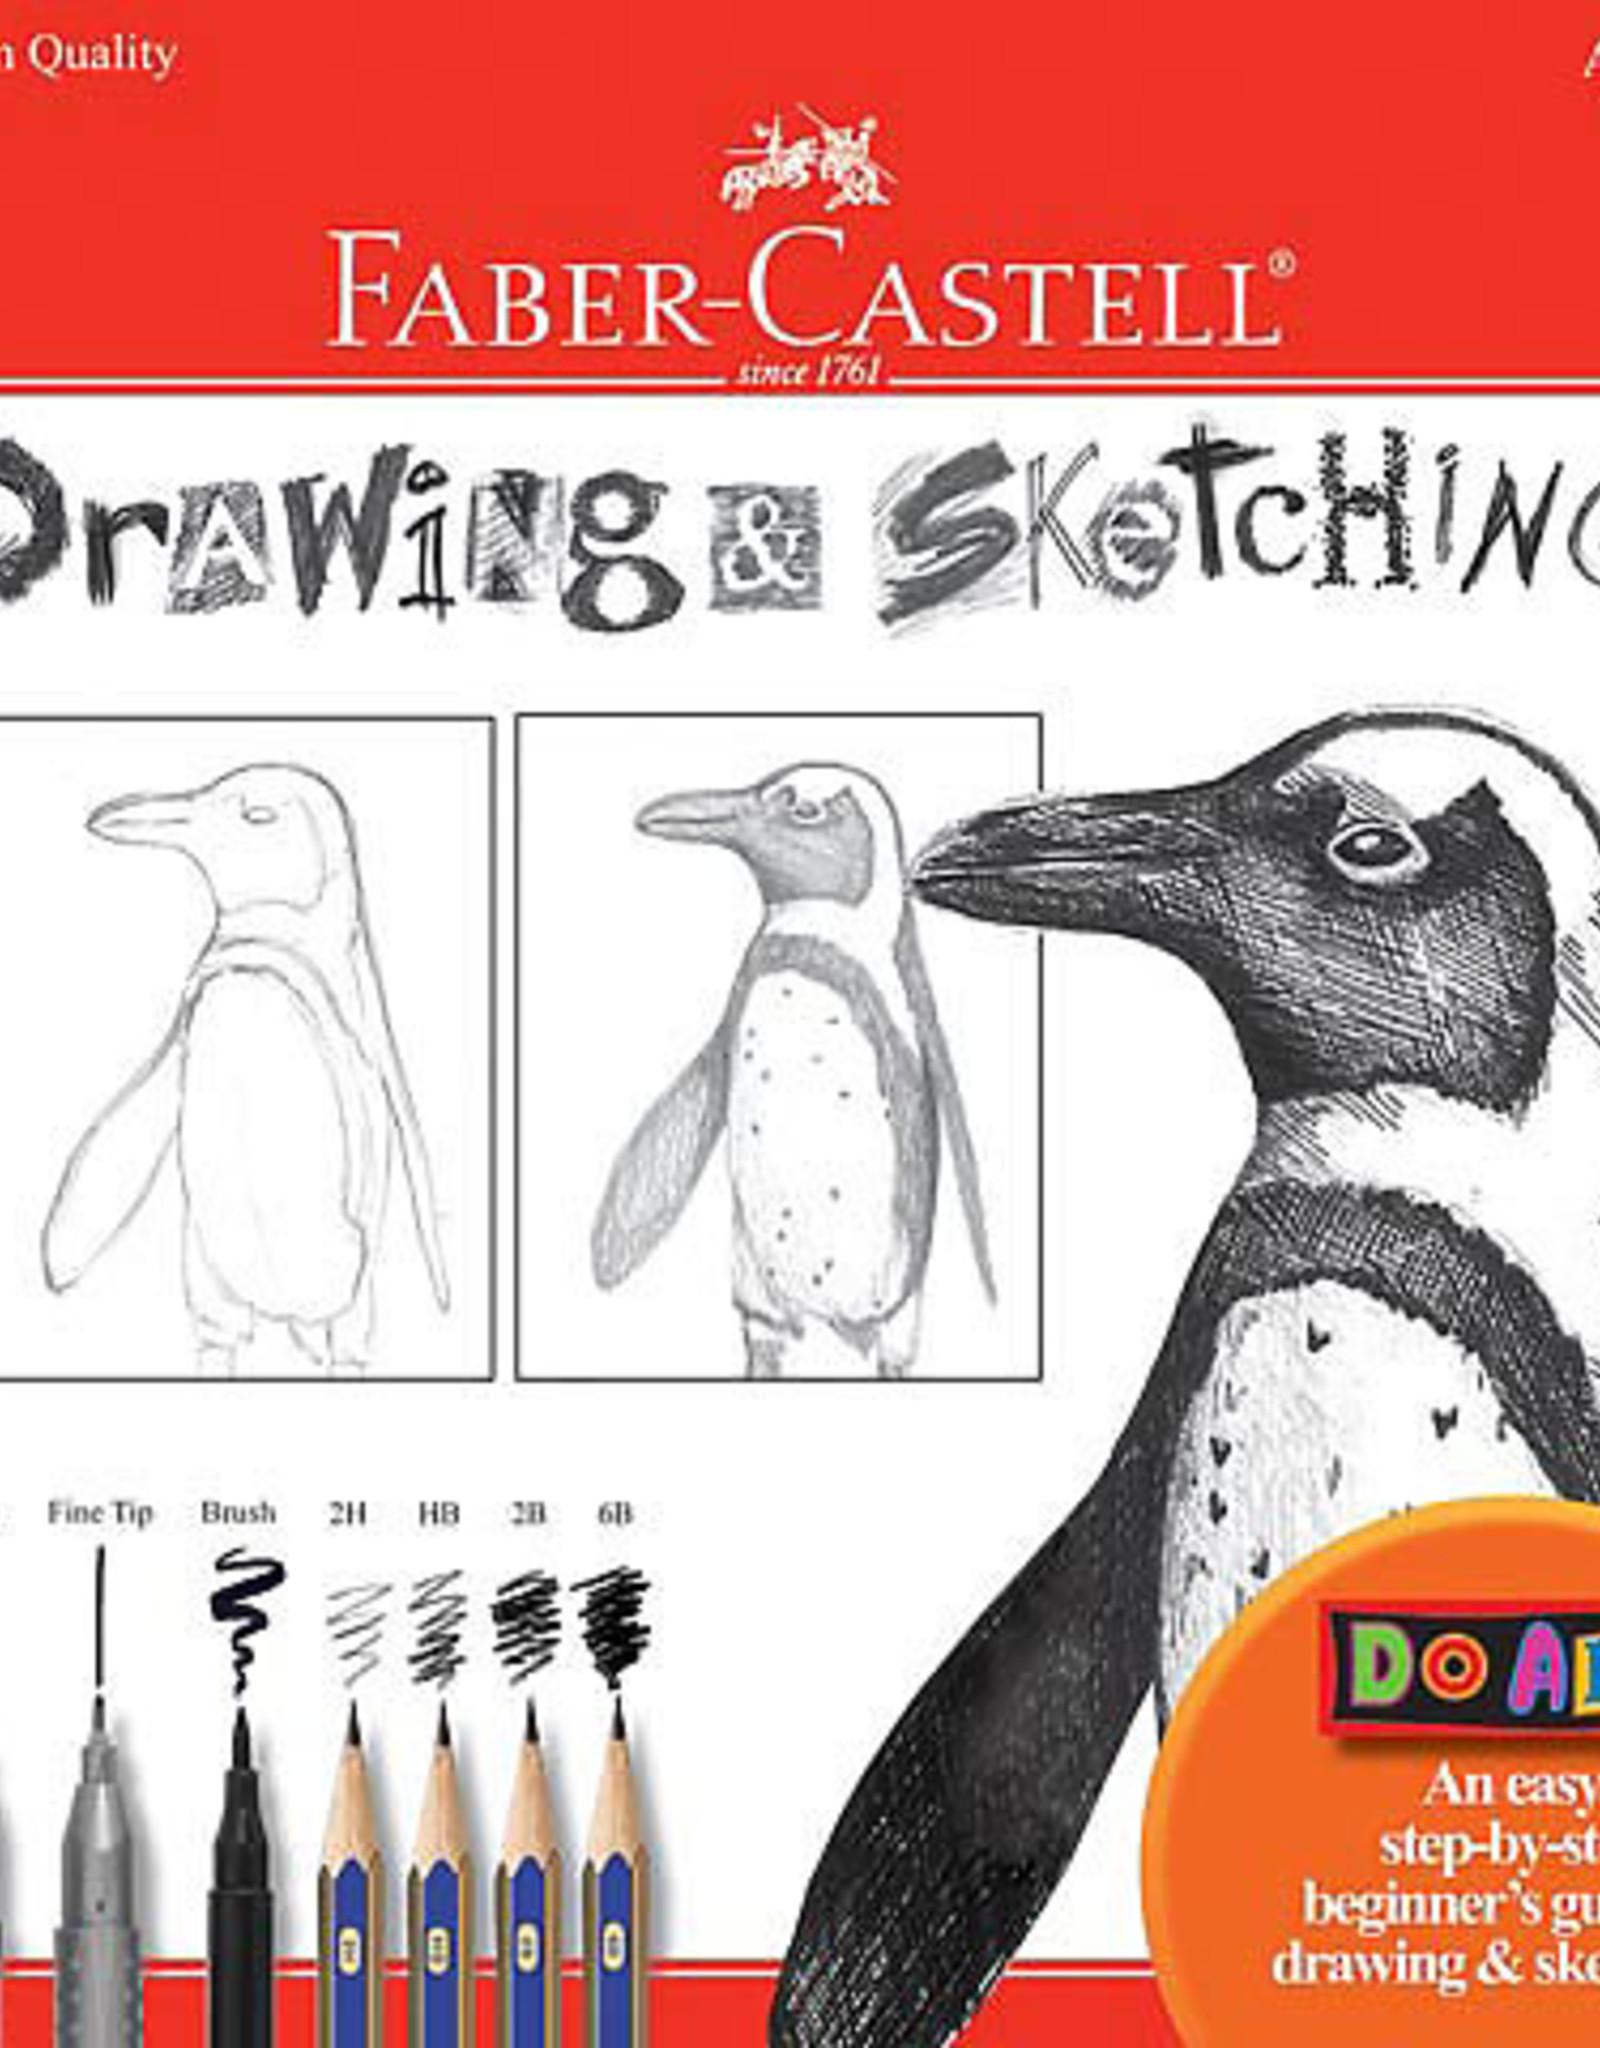 Faber-Castell Do Art Kits